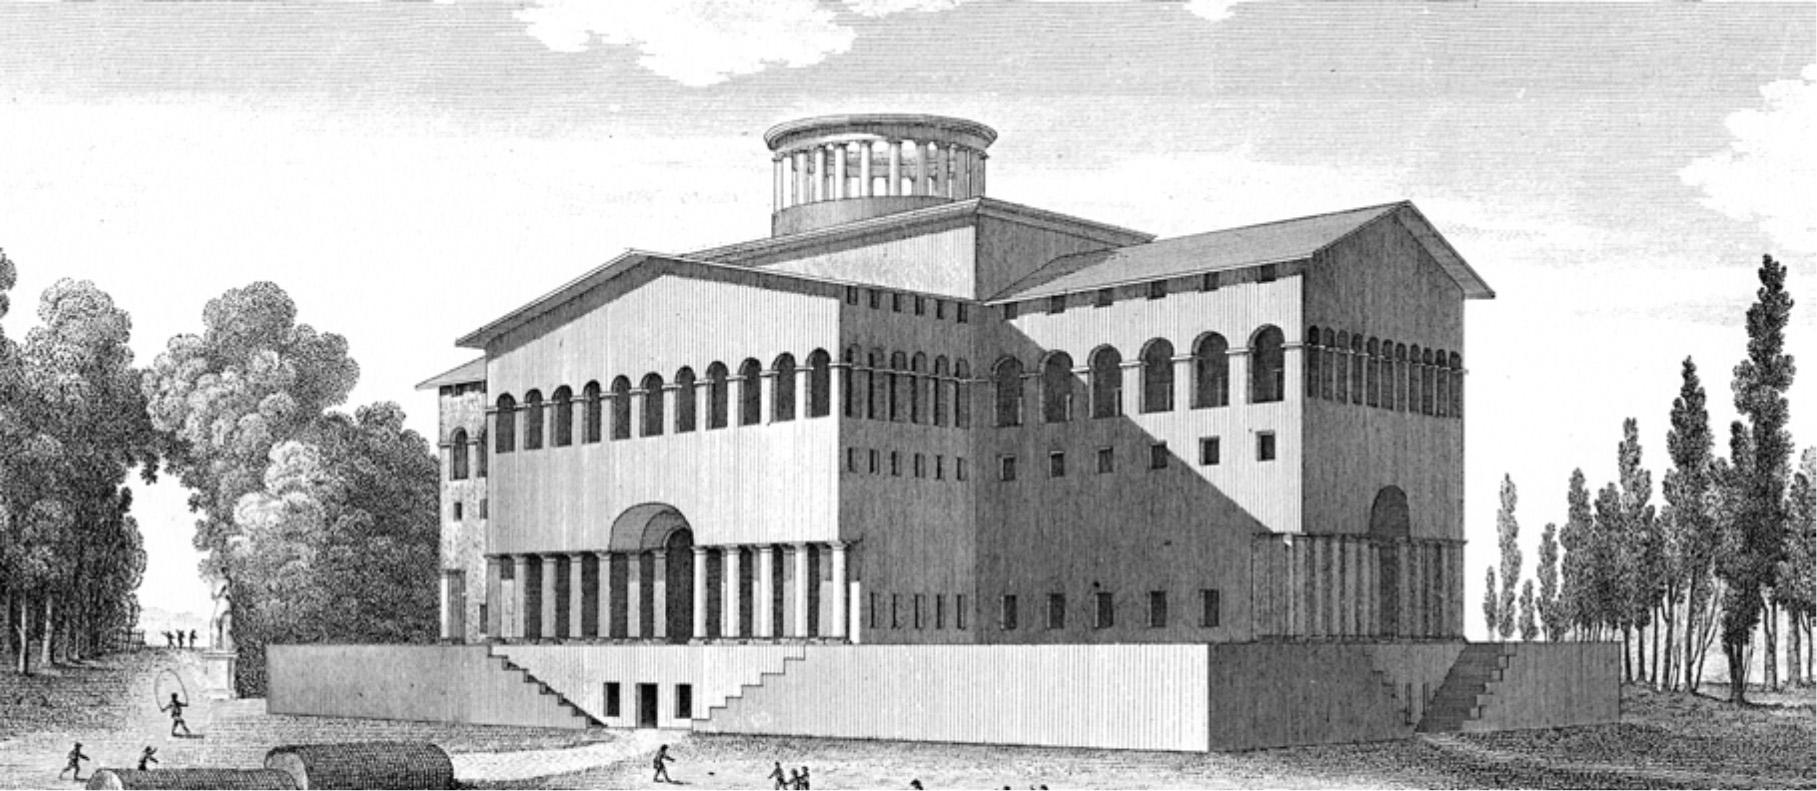 Fullsize Of Princeton Architectural Press